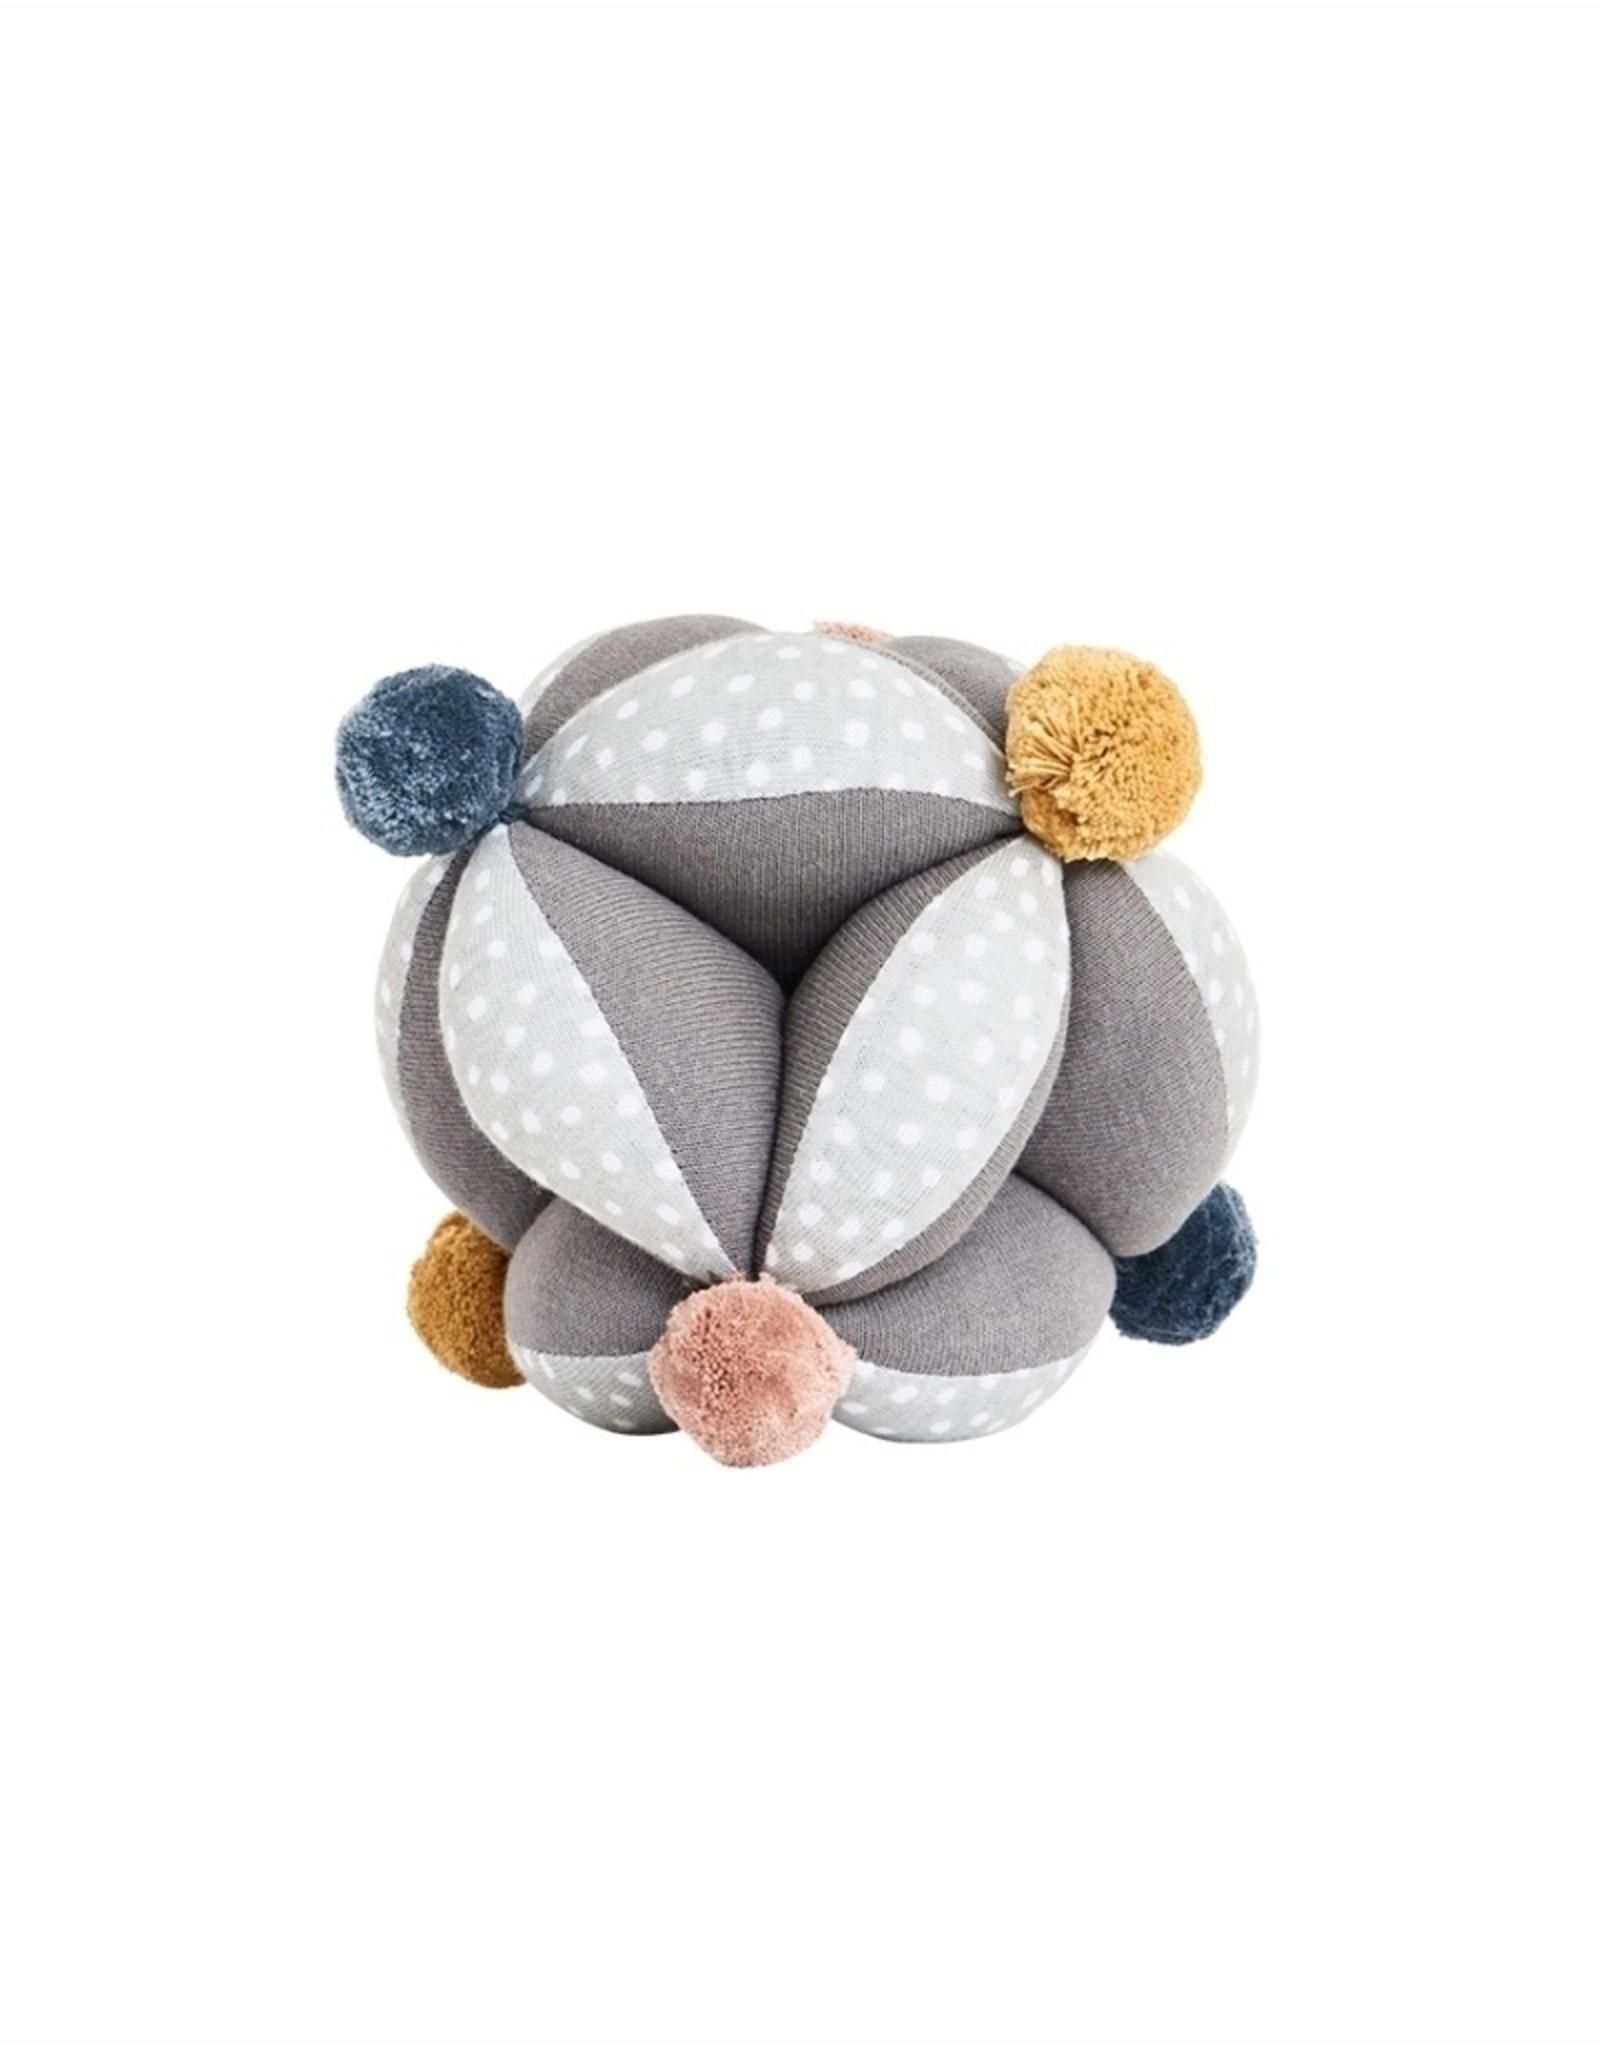 OYOY MINI OYOY - Baby juggling ball